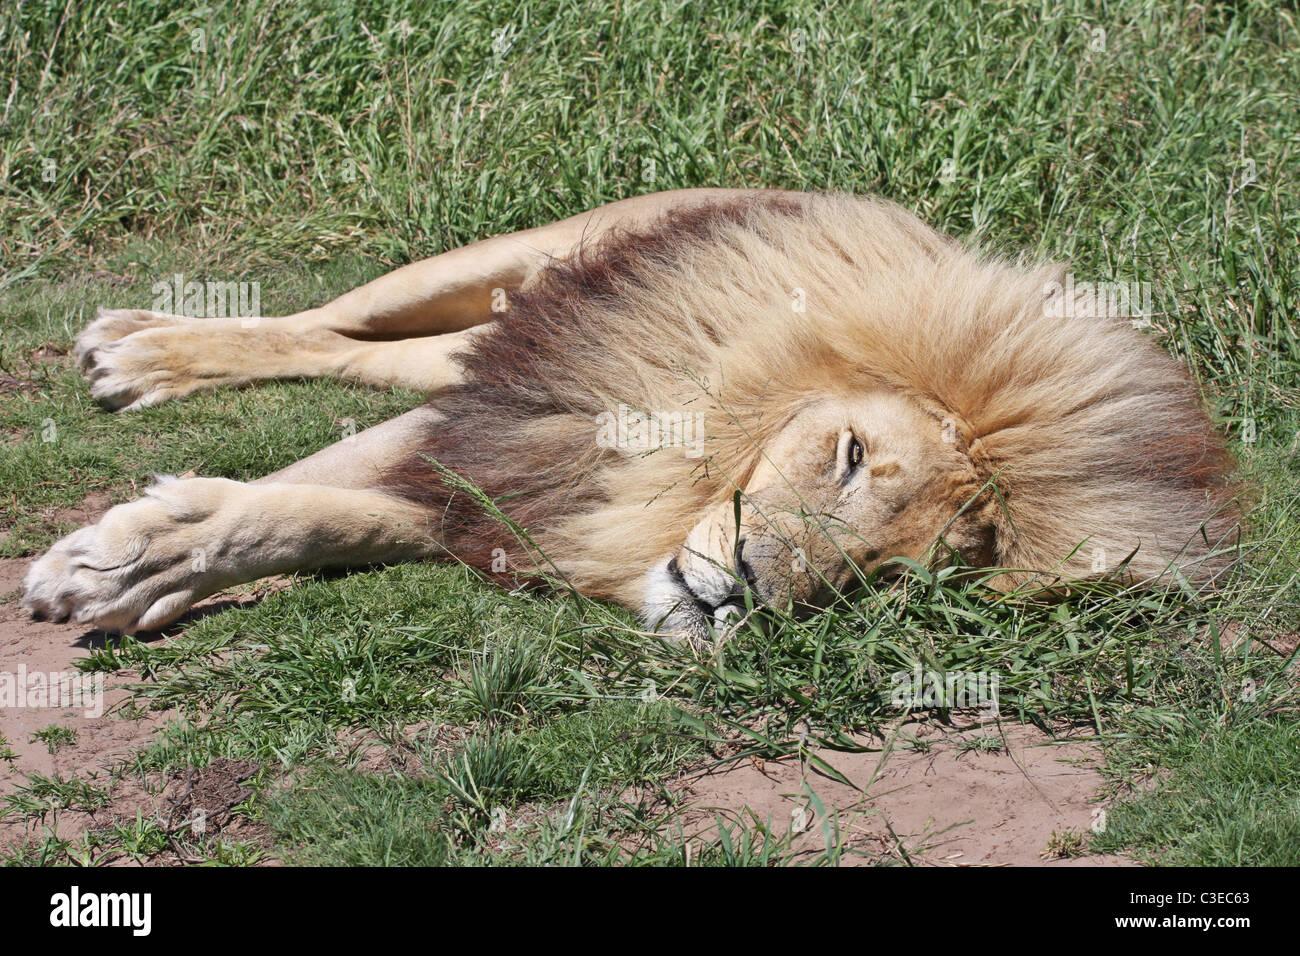 Sleeping lion, lion park, Port Elizabeth, South Africa, green plants - Stock Image